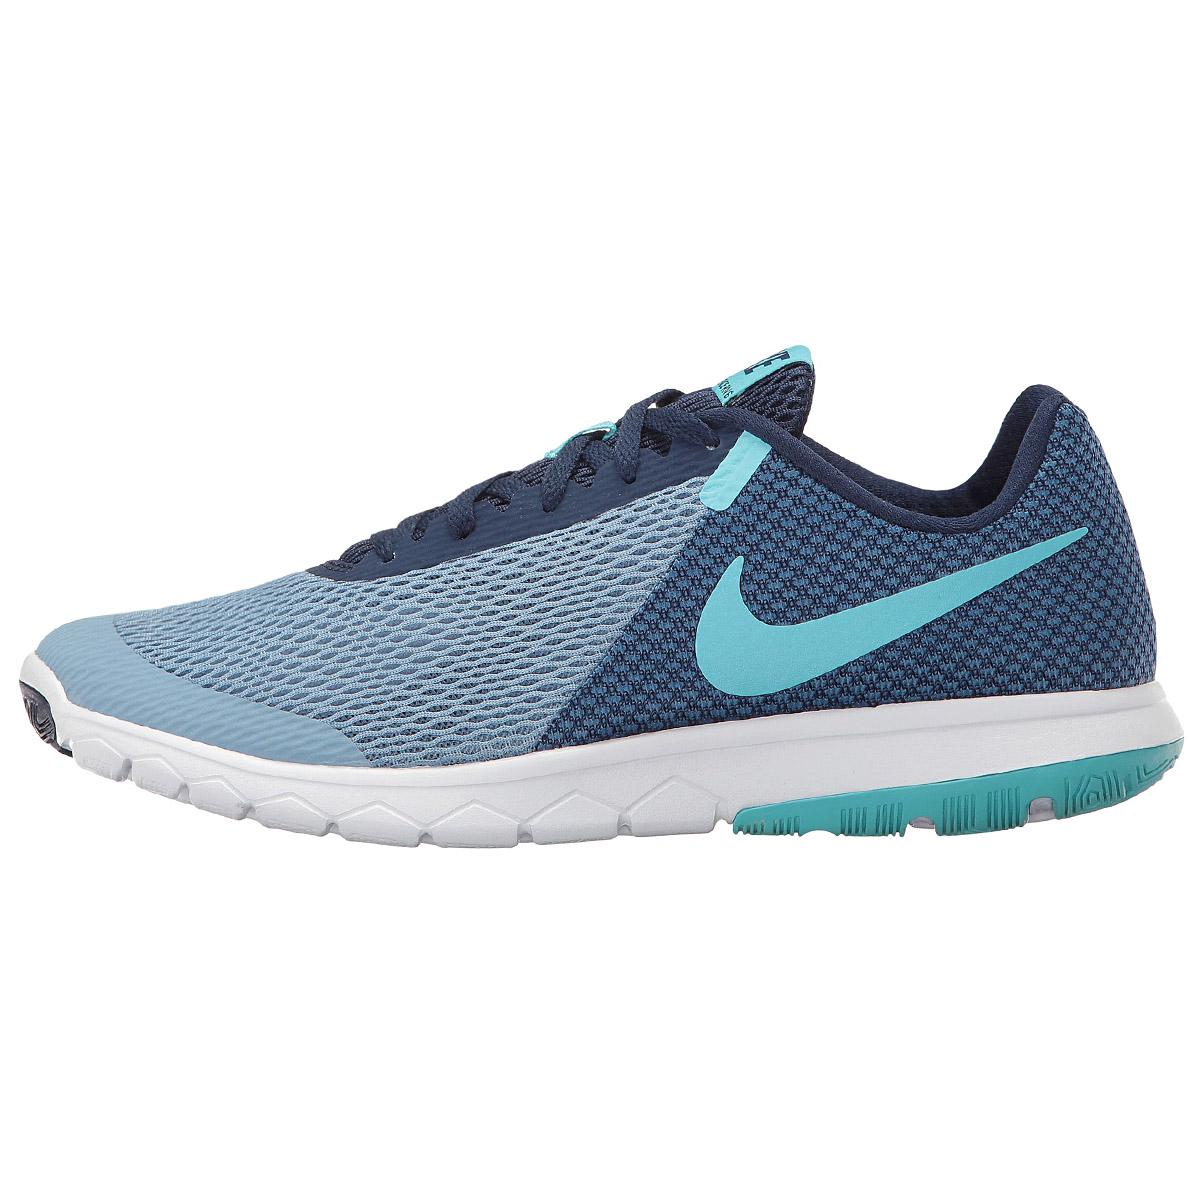 Nike Flex Experience Turnschuhe RN 6 Schuhe Herren Sneaker Sportschuhe Turnschuhe Experience RUN NEU 12cb8d